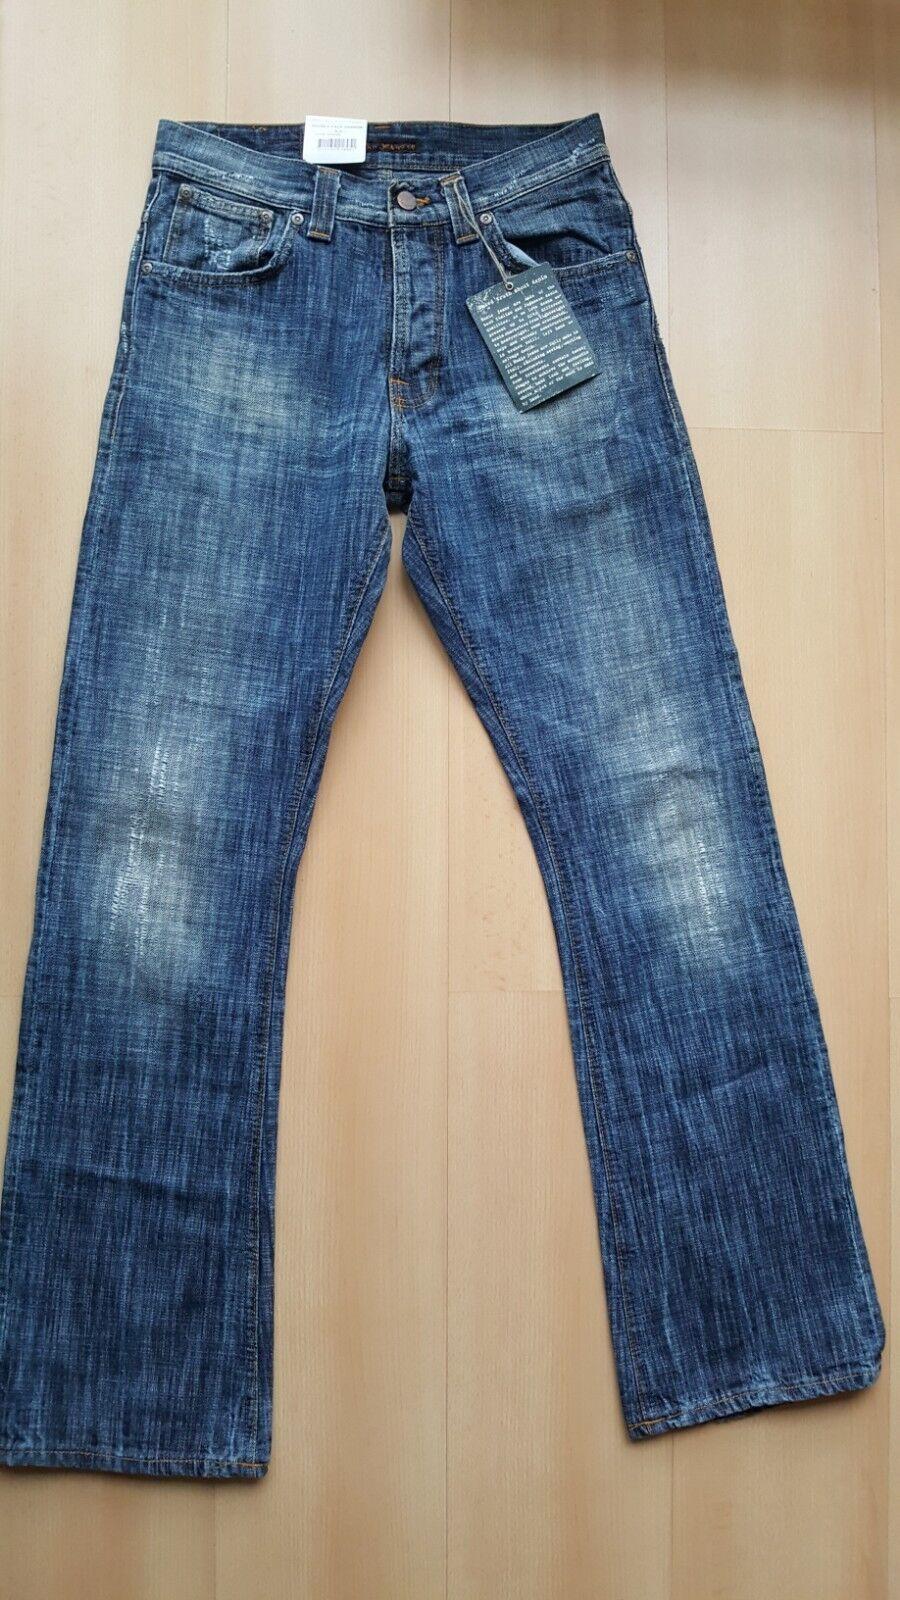 NUDIE Jeans Regular Ralf Double Face Damage Denim Trousers Unisex W29 L32